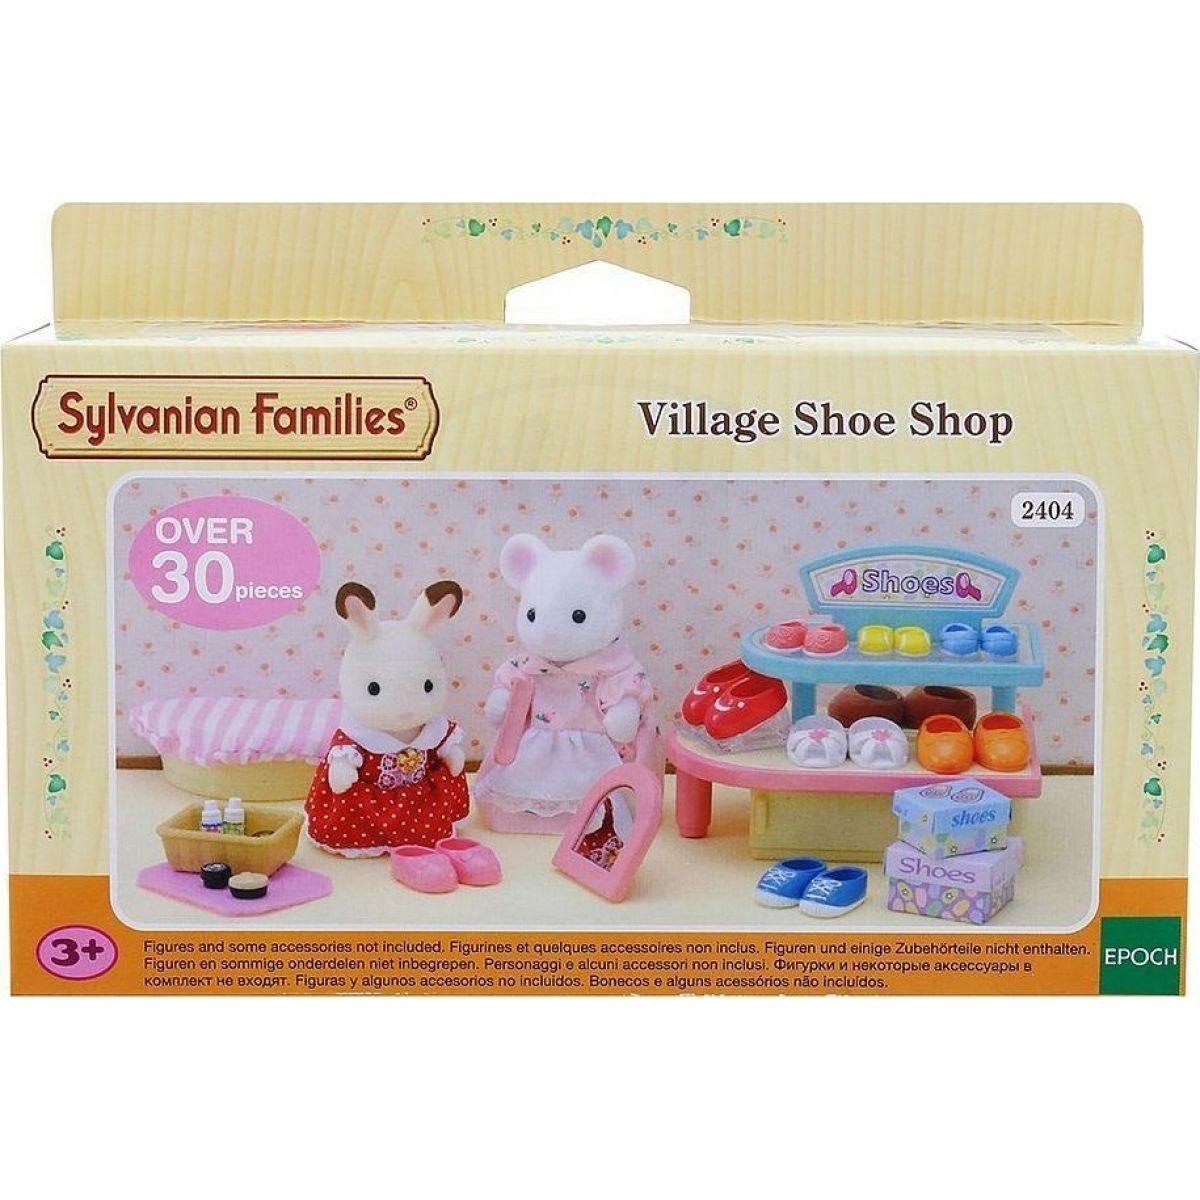 85f4151dda89 Sylvanian Families Vidiecky obchod s topánkami 2 Sylvanian Families  Vidiecky obchod s topánkami 3 ...